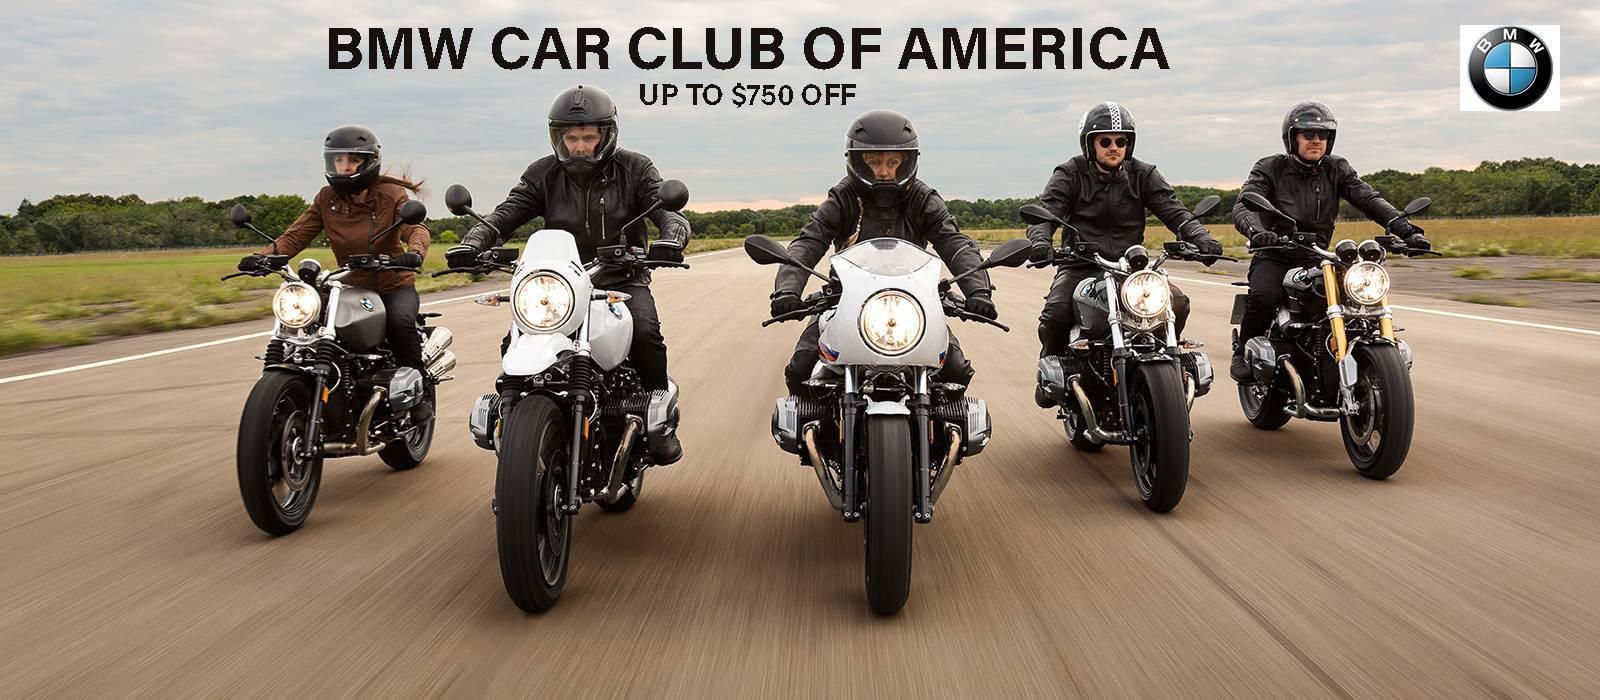 BMW - BMW Car Club of America Members Program